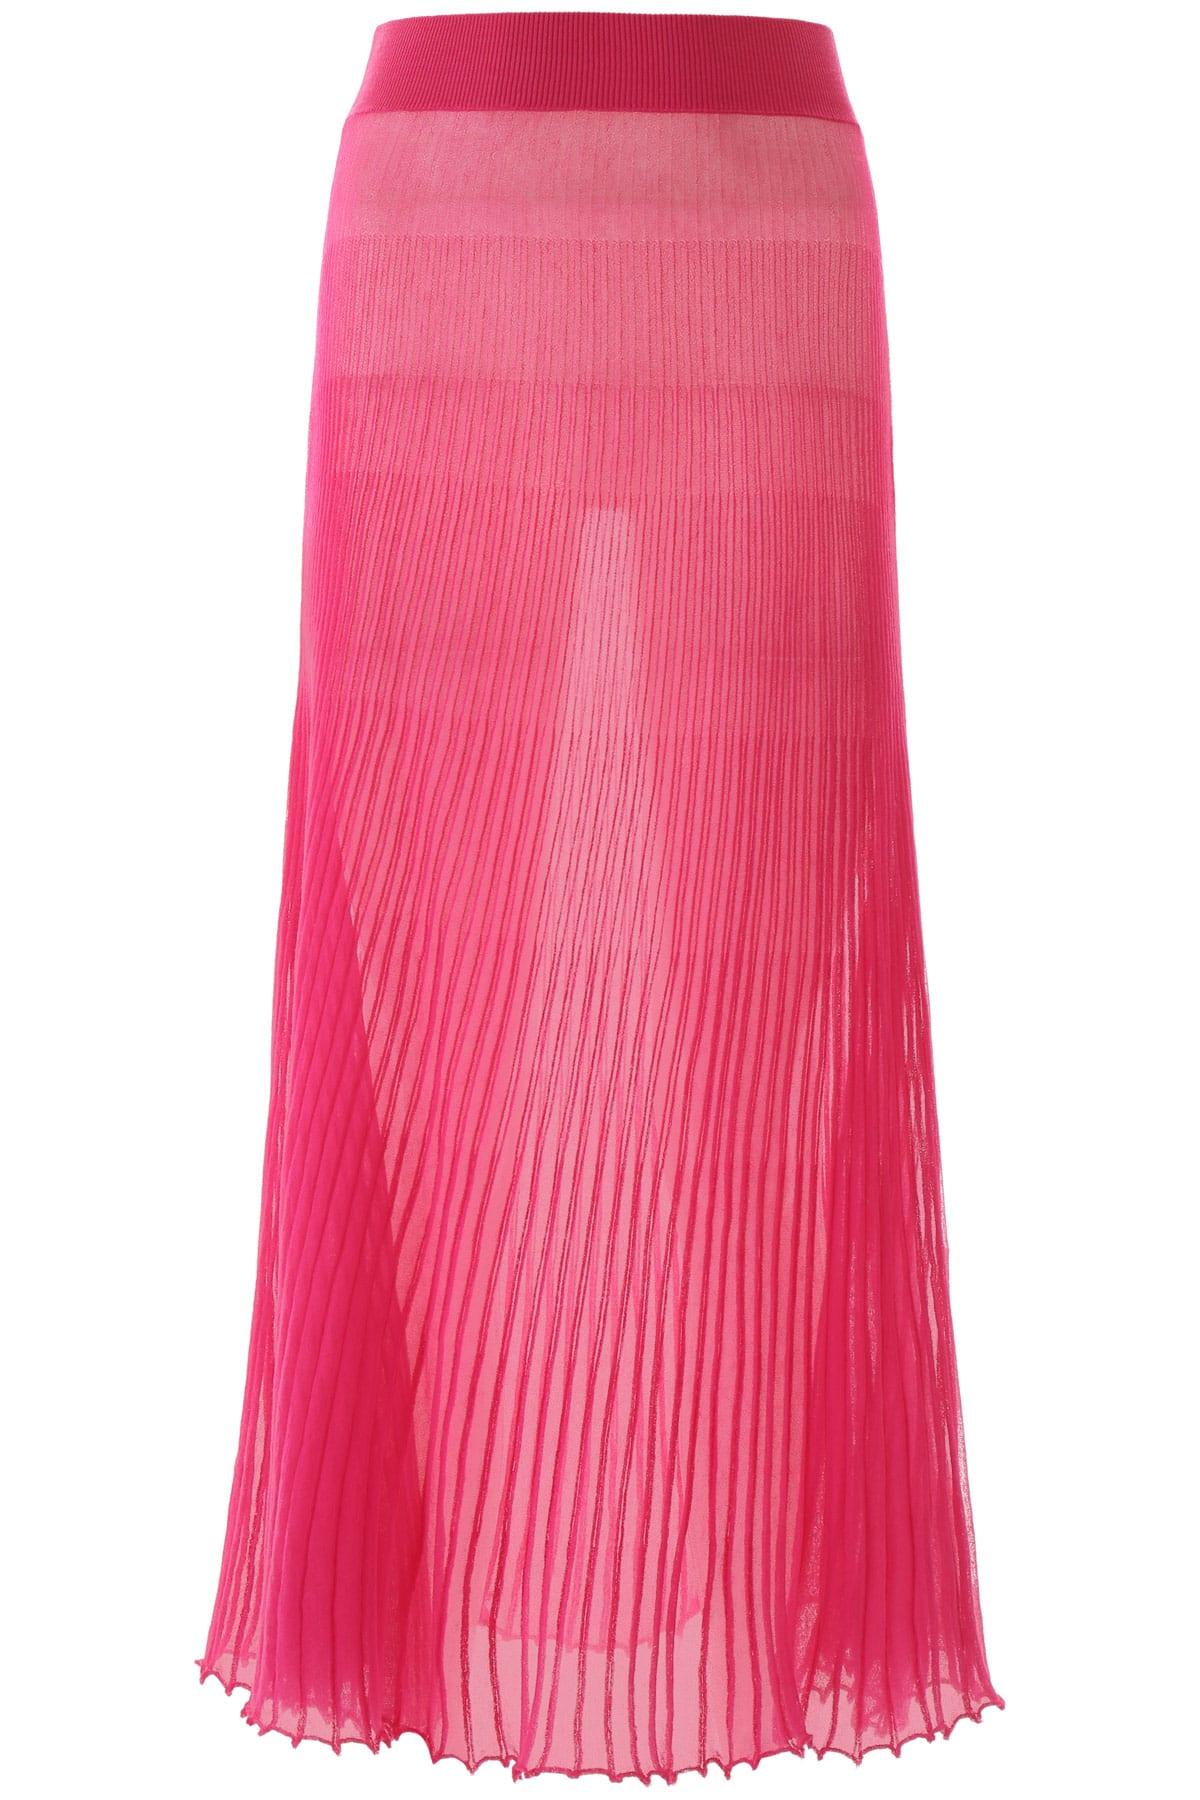 Jacquemus Helado Long Skirt